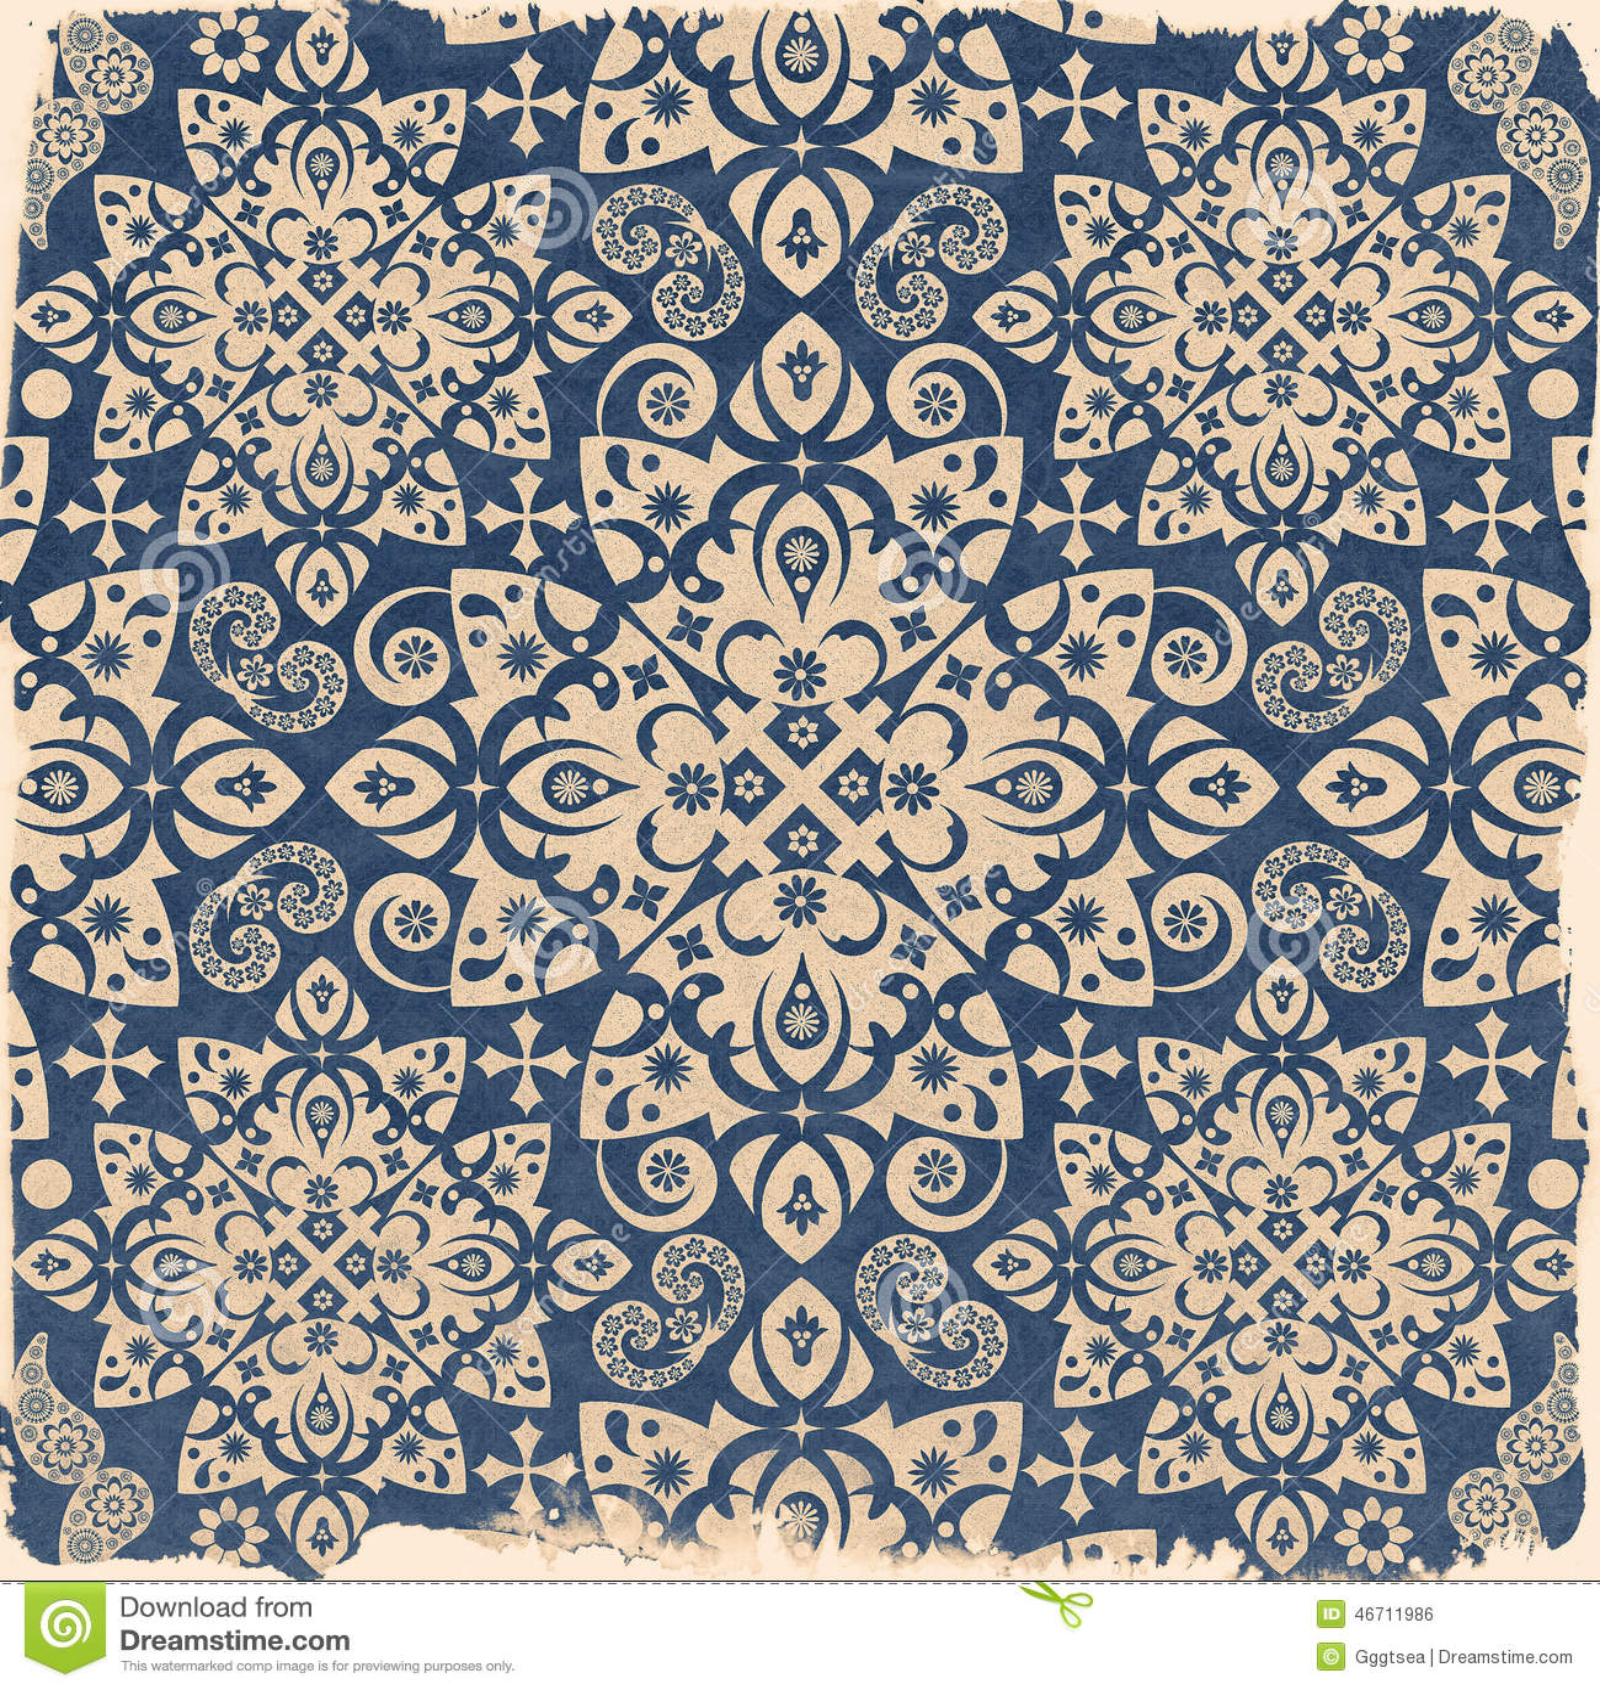 papier peint d coratif d 39 ornement illustration stock image 46711986. Black Bedroom Furniture Sets. Home Design Ideas